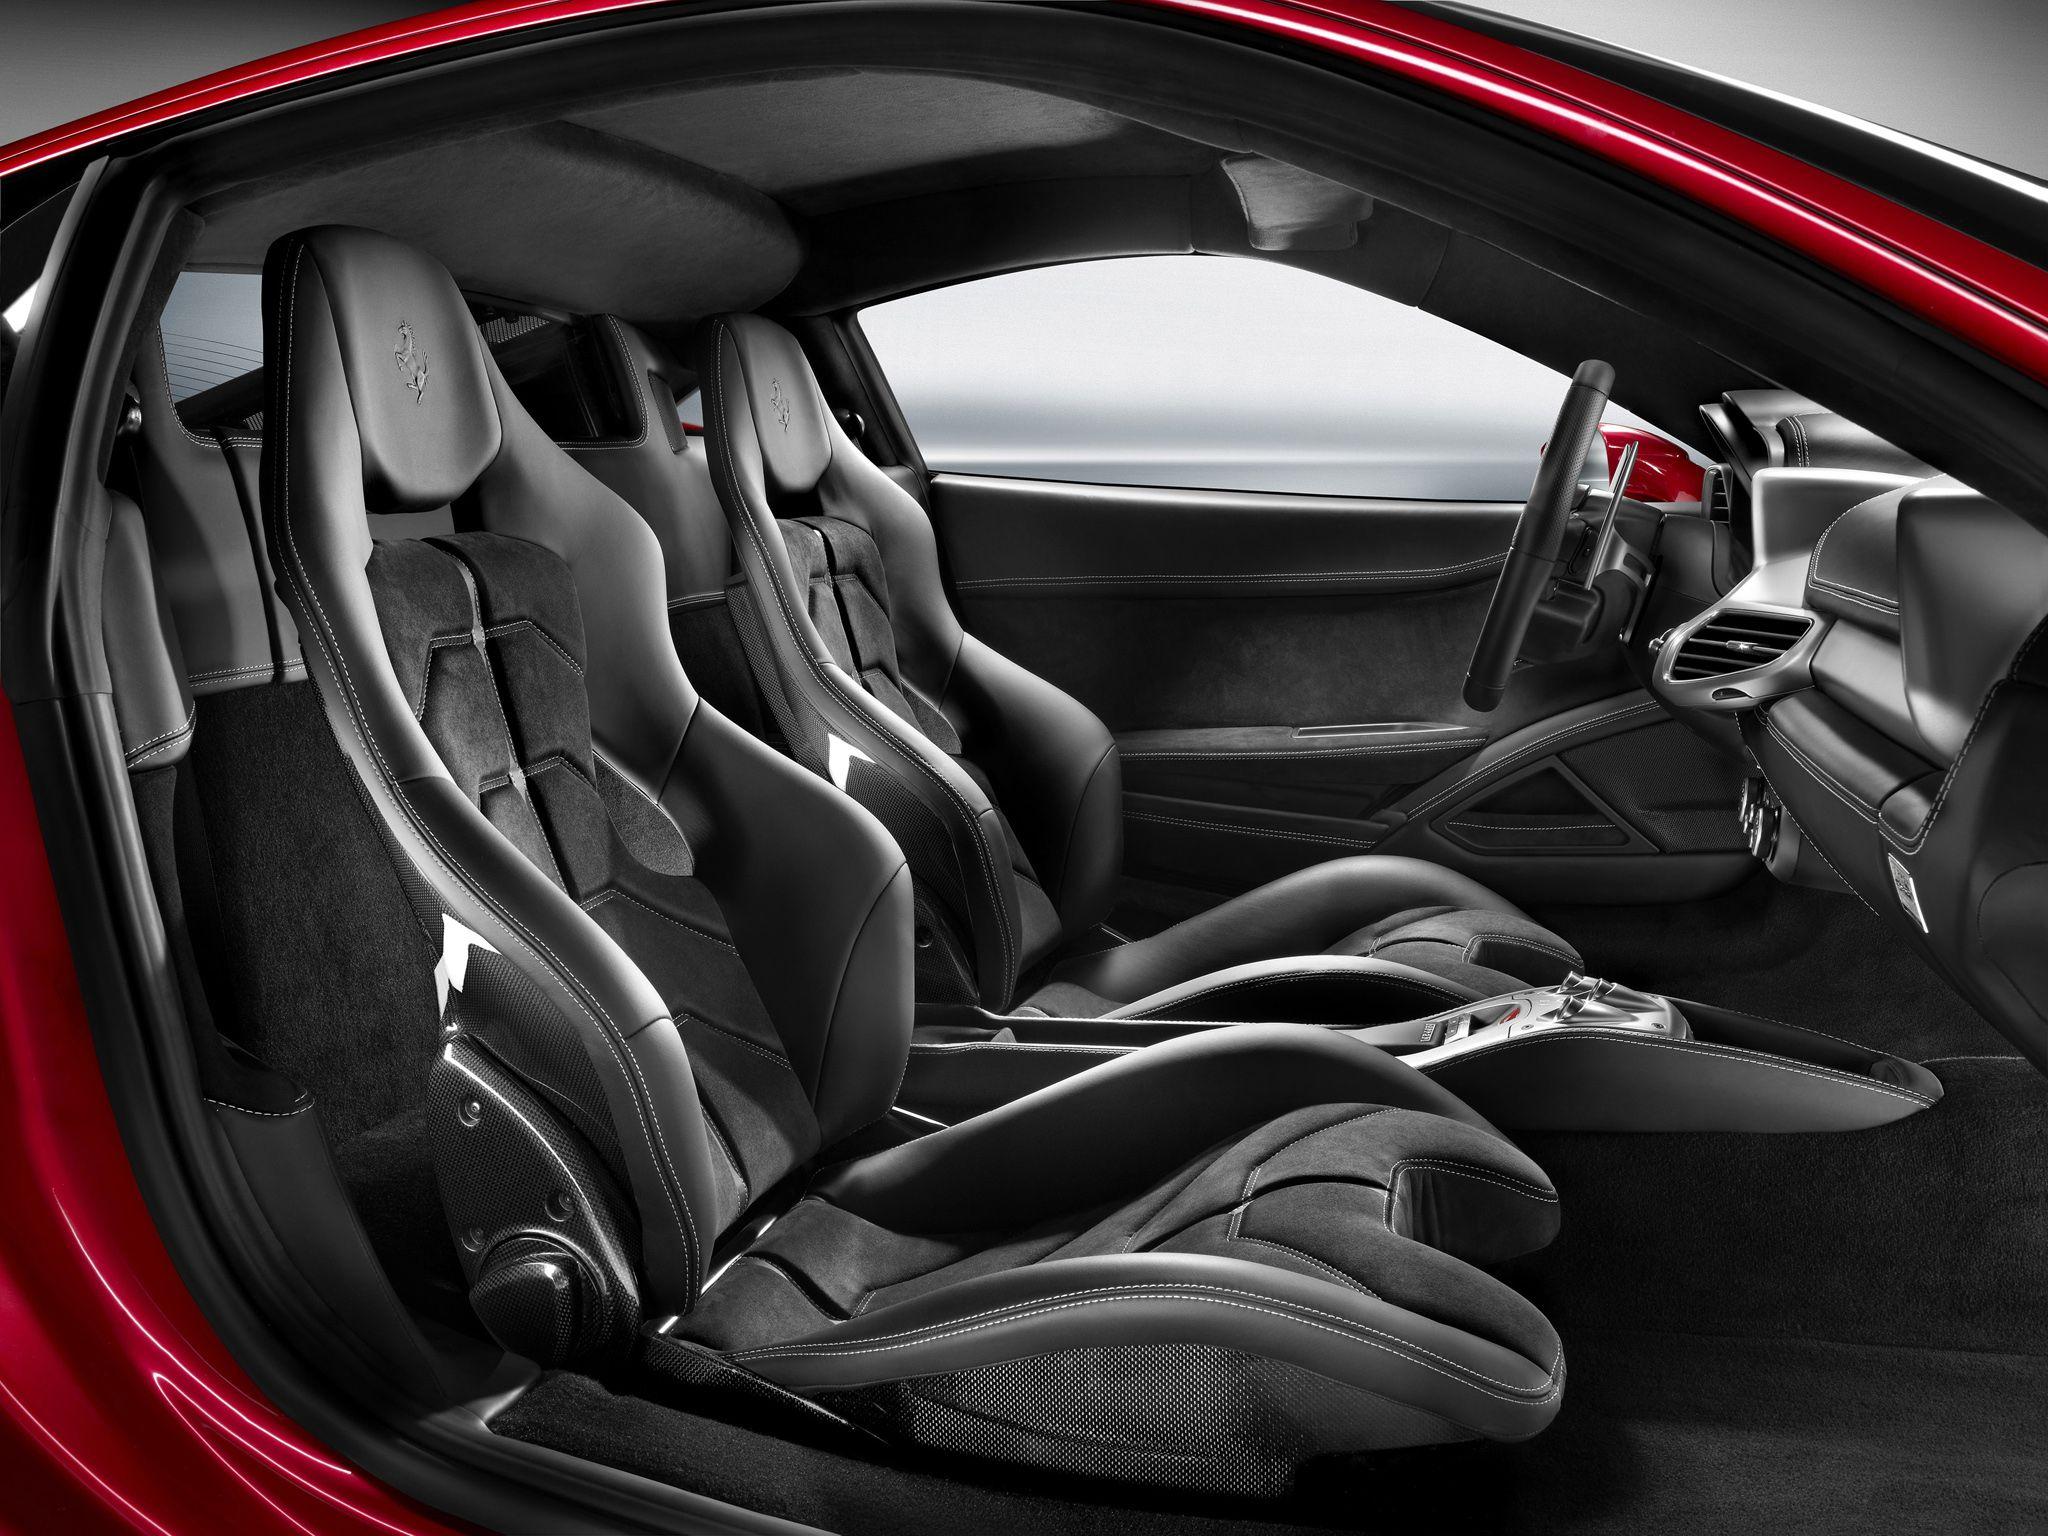 Ferrari 458 Italia Interior I Love The Carbon Fiber Bucket Seats